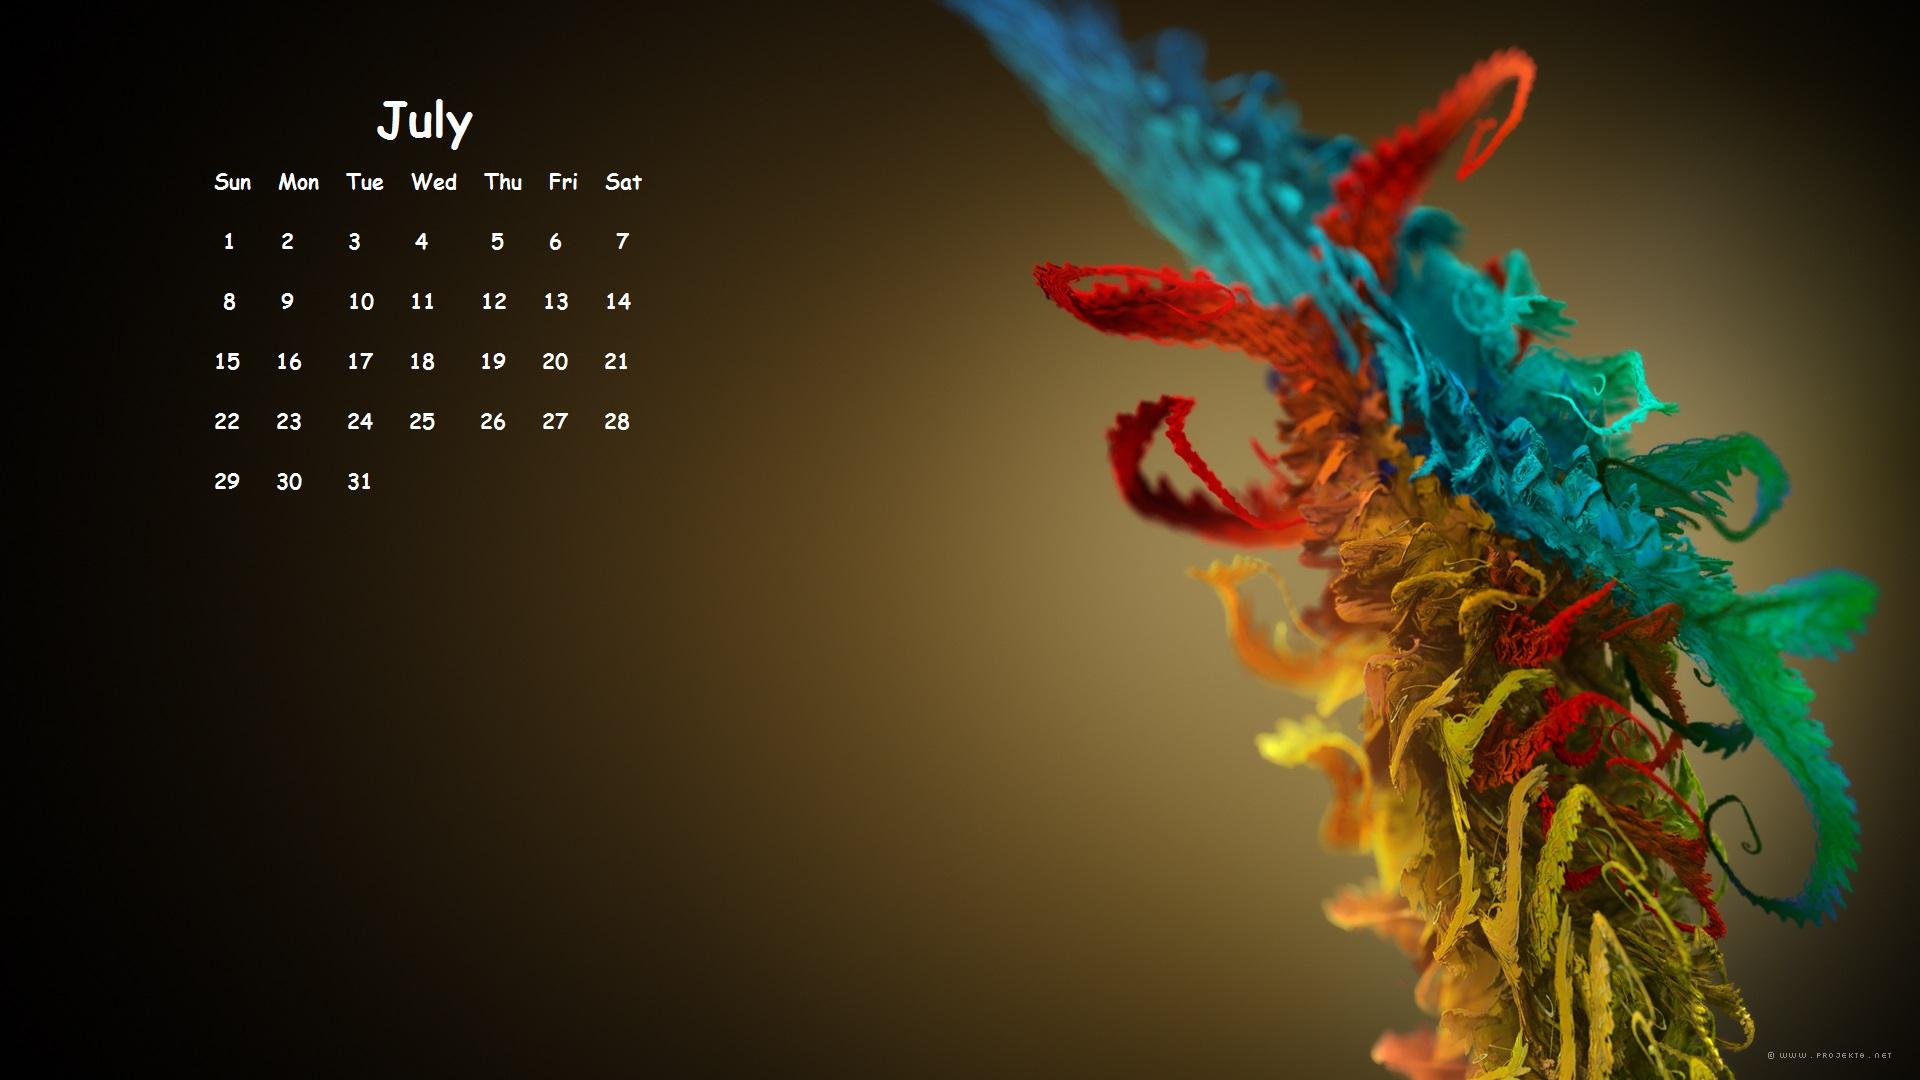 July 2018 Desktop Calendar HD